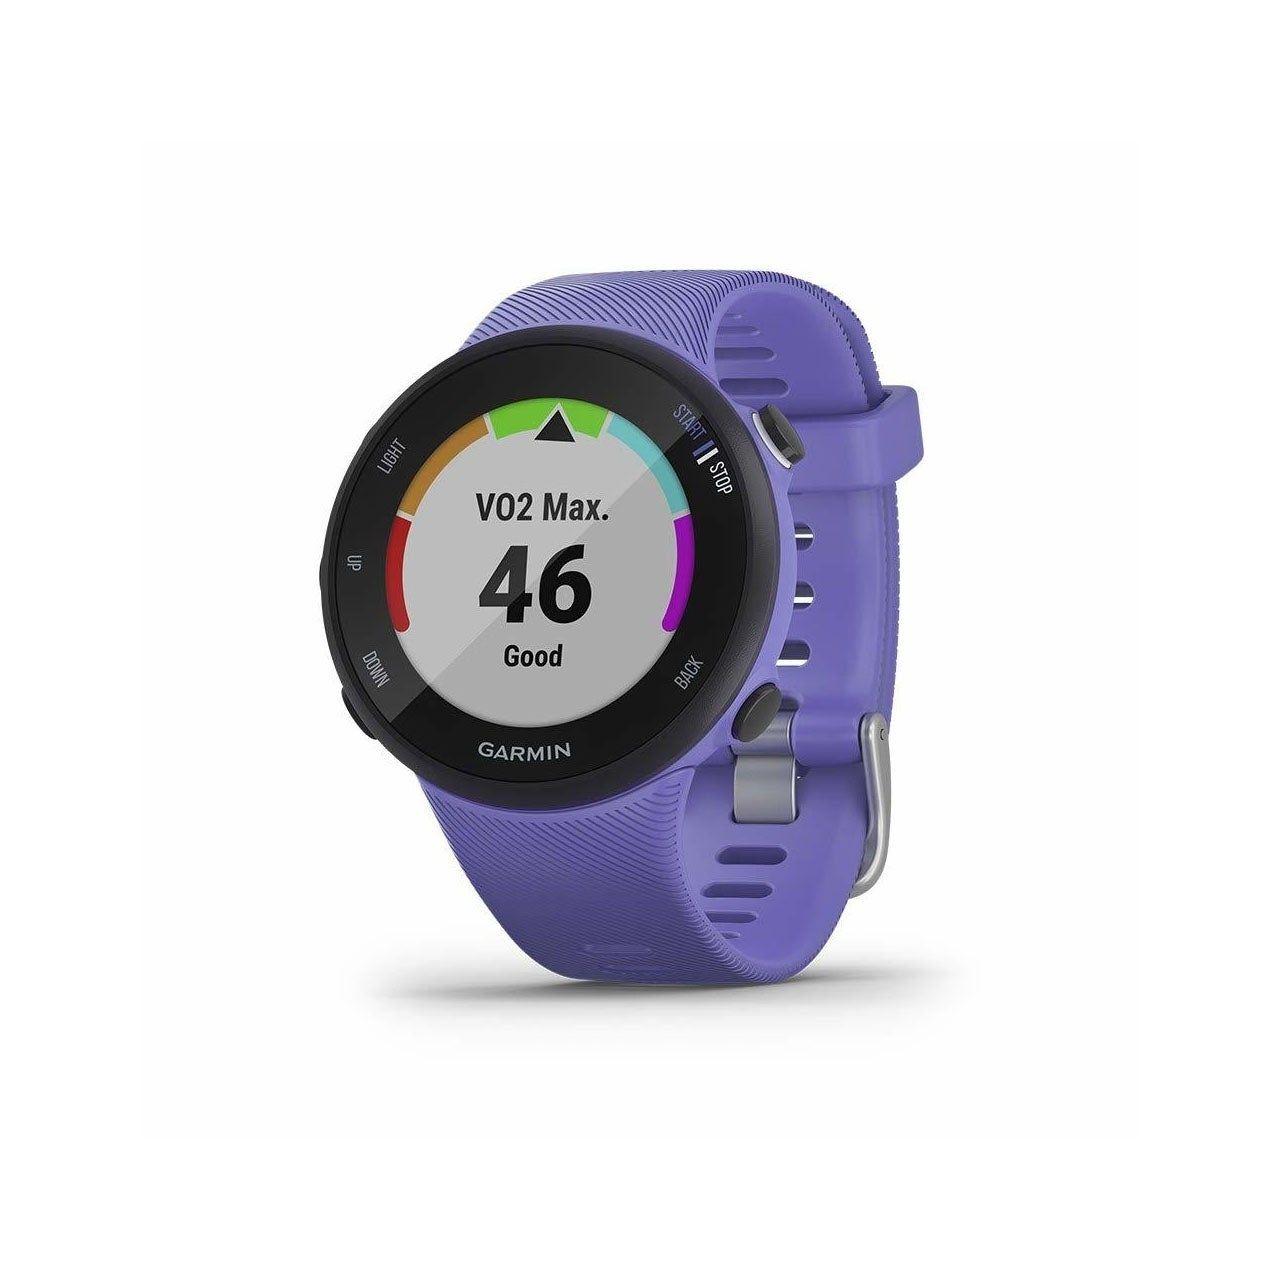 Garmin Forerunner 45s, 39MM EasytoUse GPS Running Watch